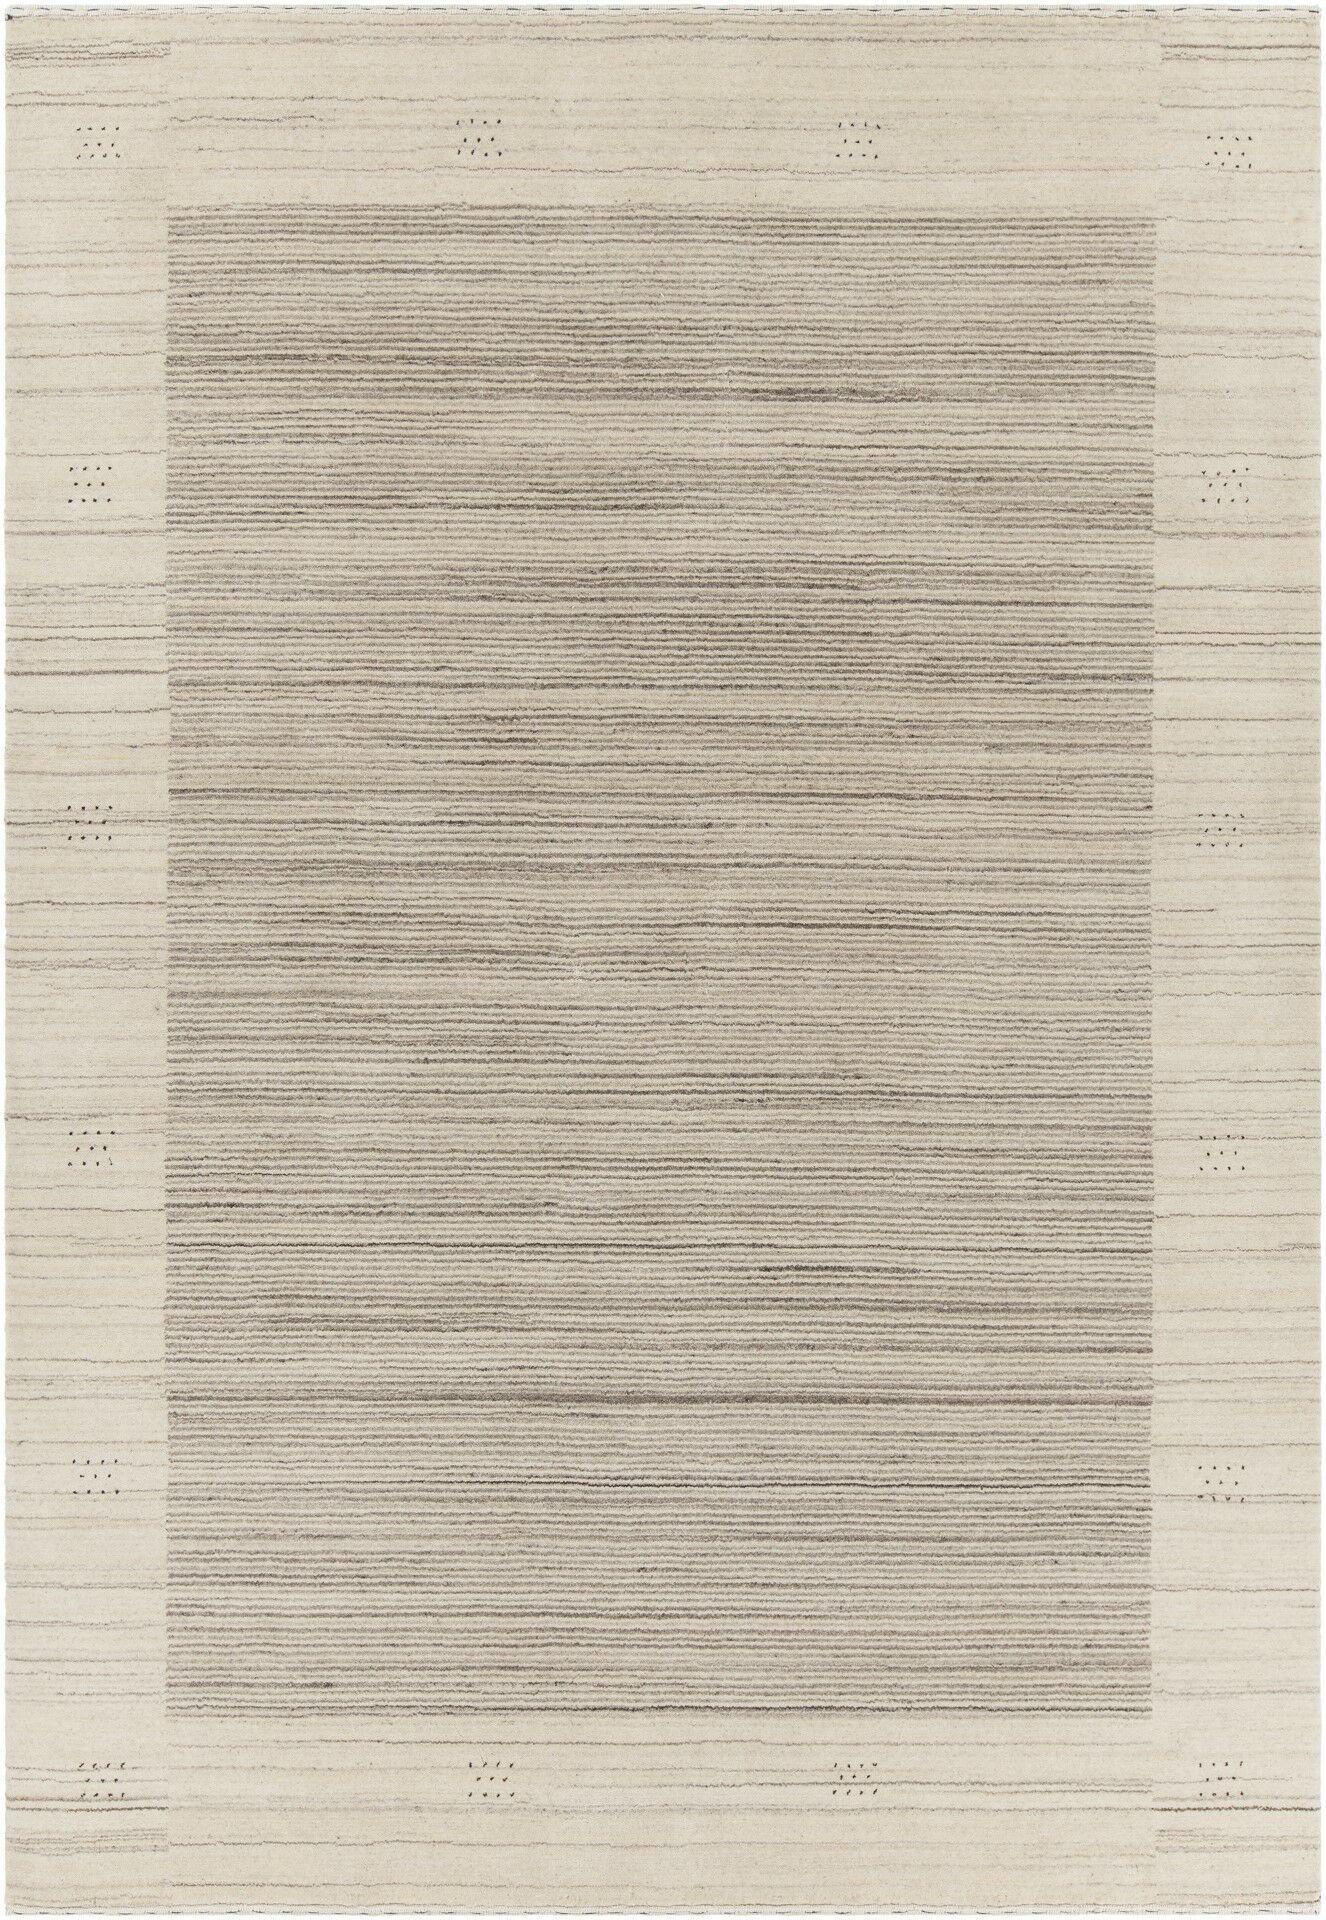 Roxanne Patterned Wool Beige Area Rug Rug Size: 5' x 7'6